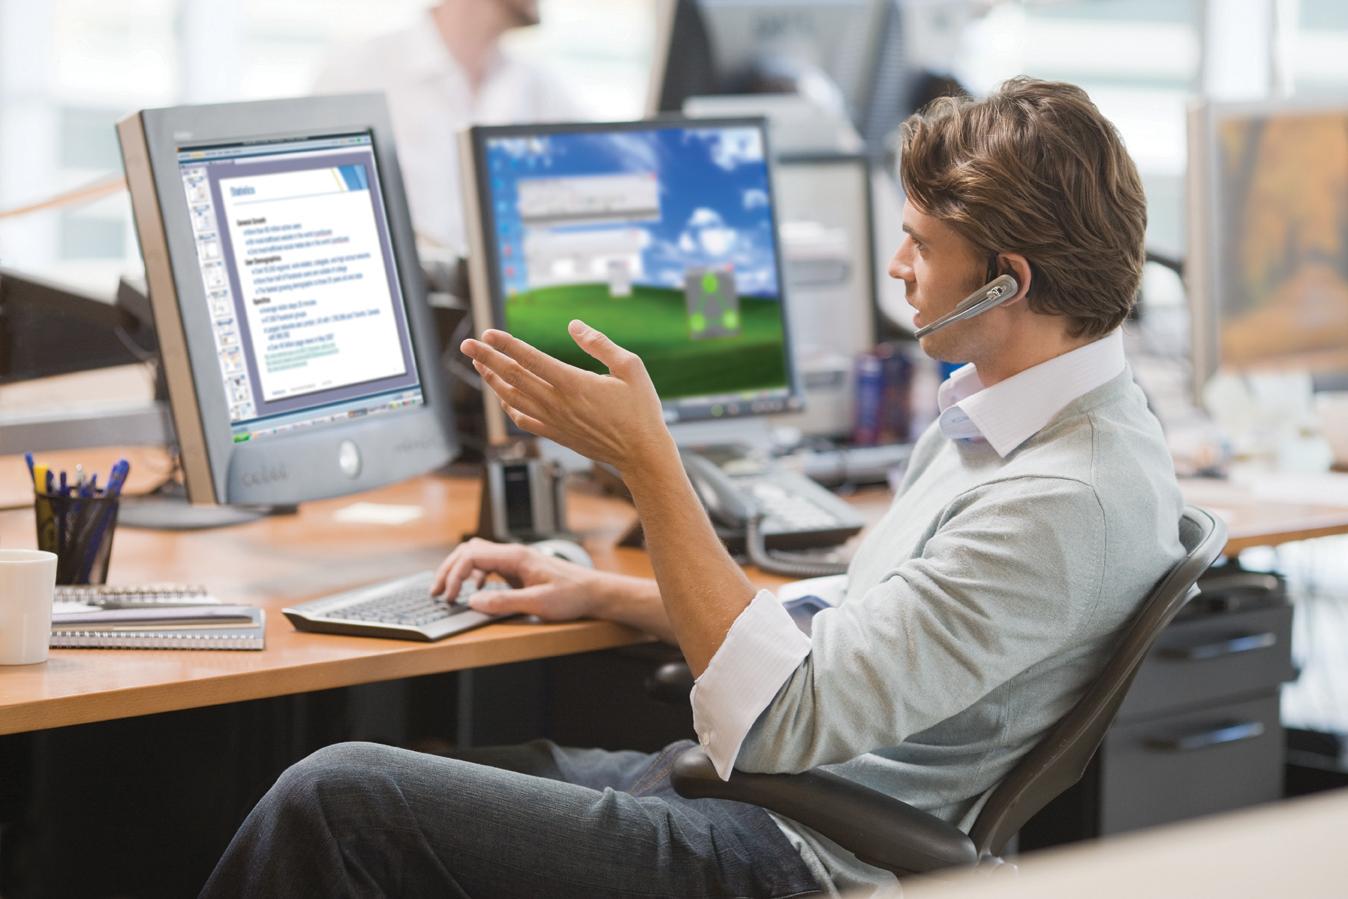 Call-центр как средство увеличения продаж